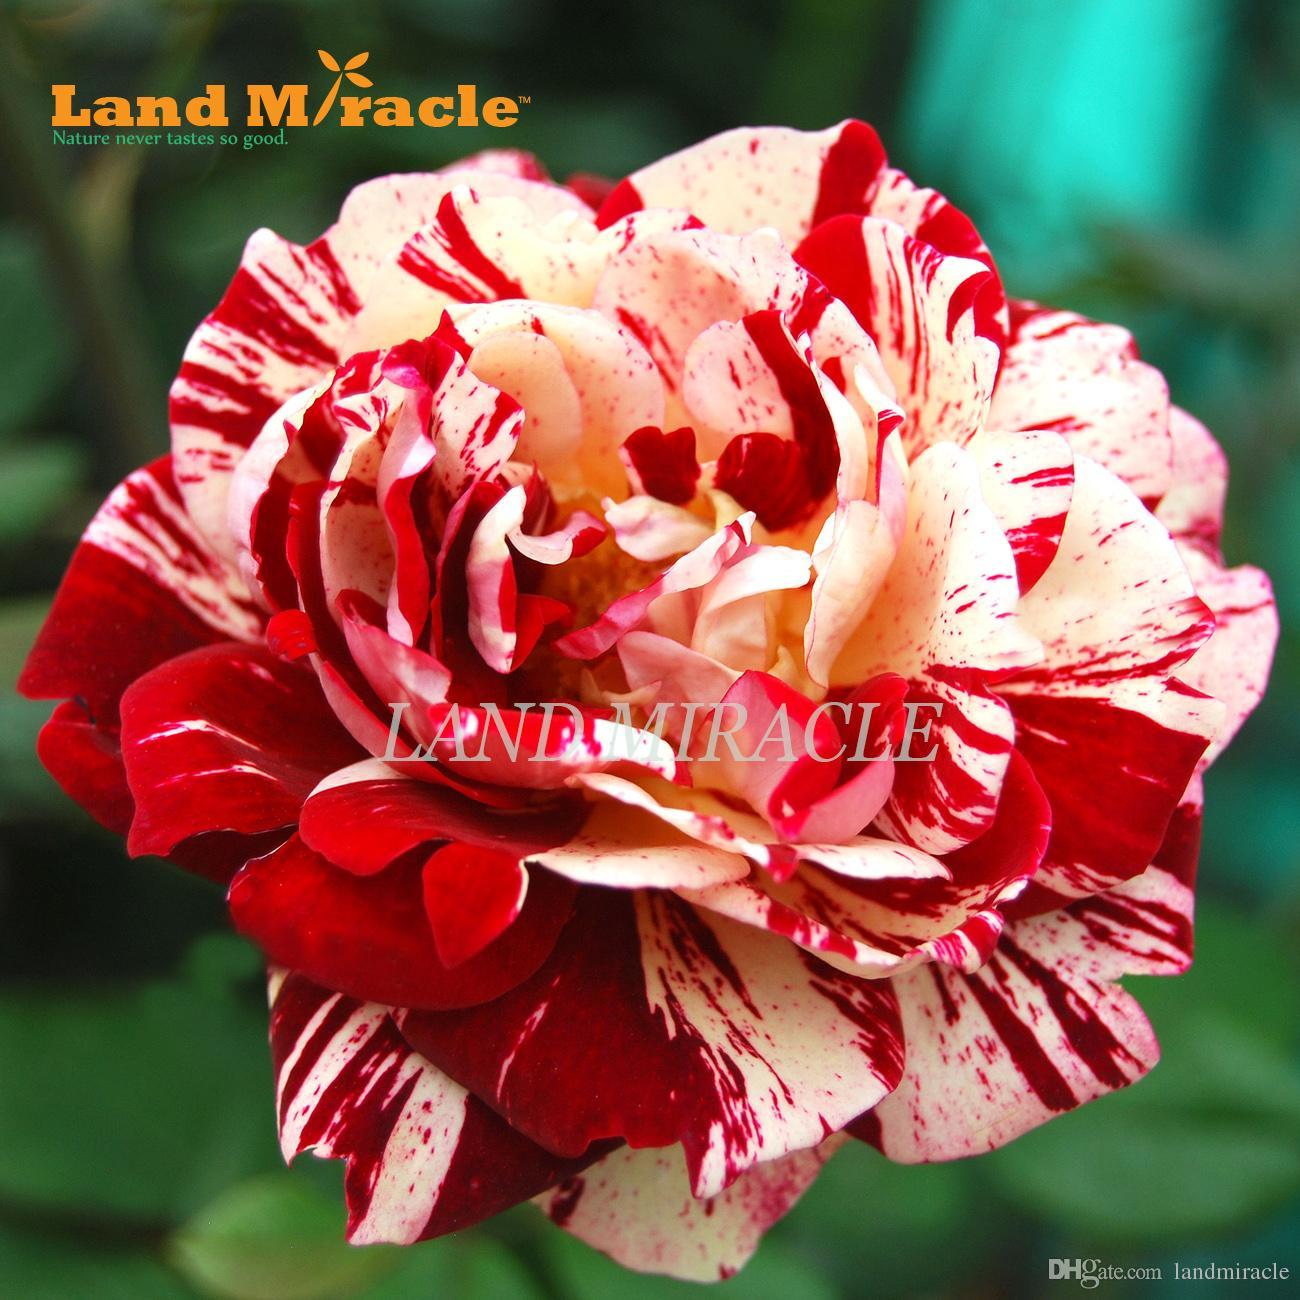 100 seeds / pack, Rare Black Dragon Hybrid Rose Seeds, Heirloom Red and White Rose flower seeds Planting for DIY home garden Bonsai Plant